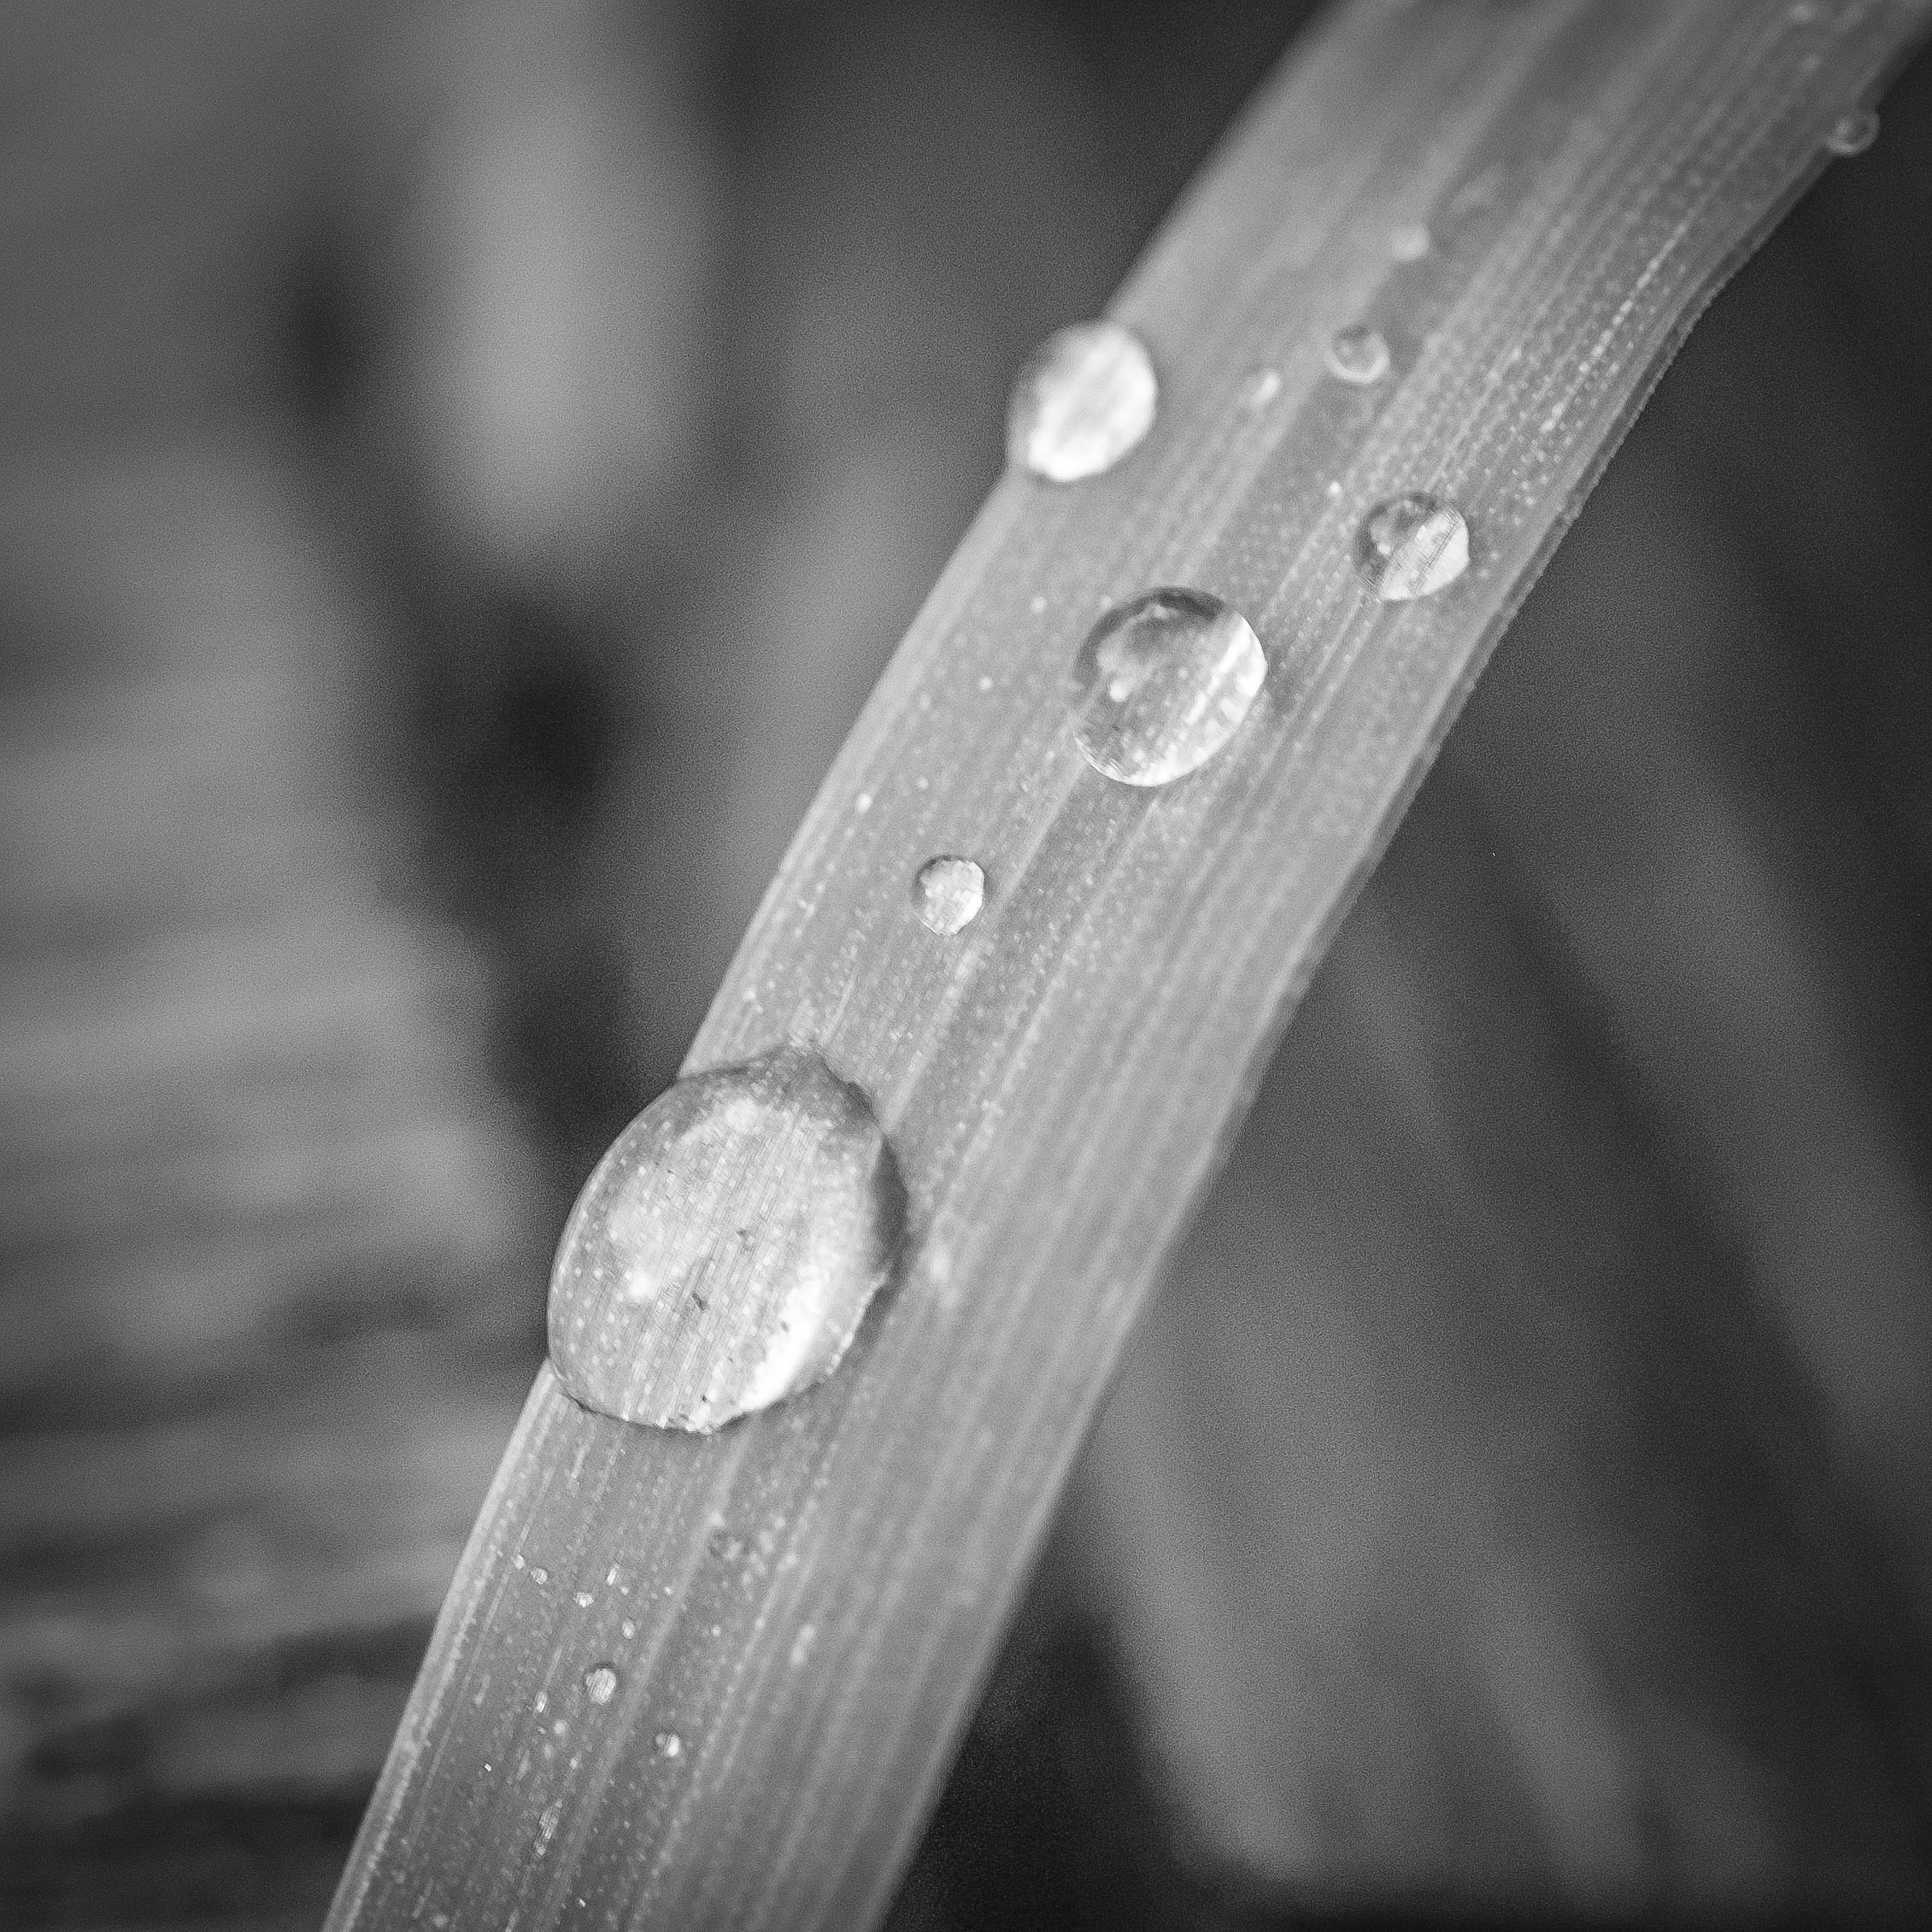 raindrops_12July2016_ALI31329.jpg